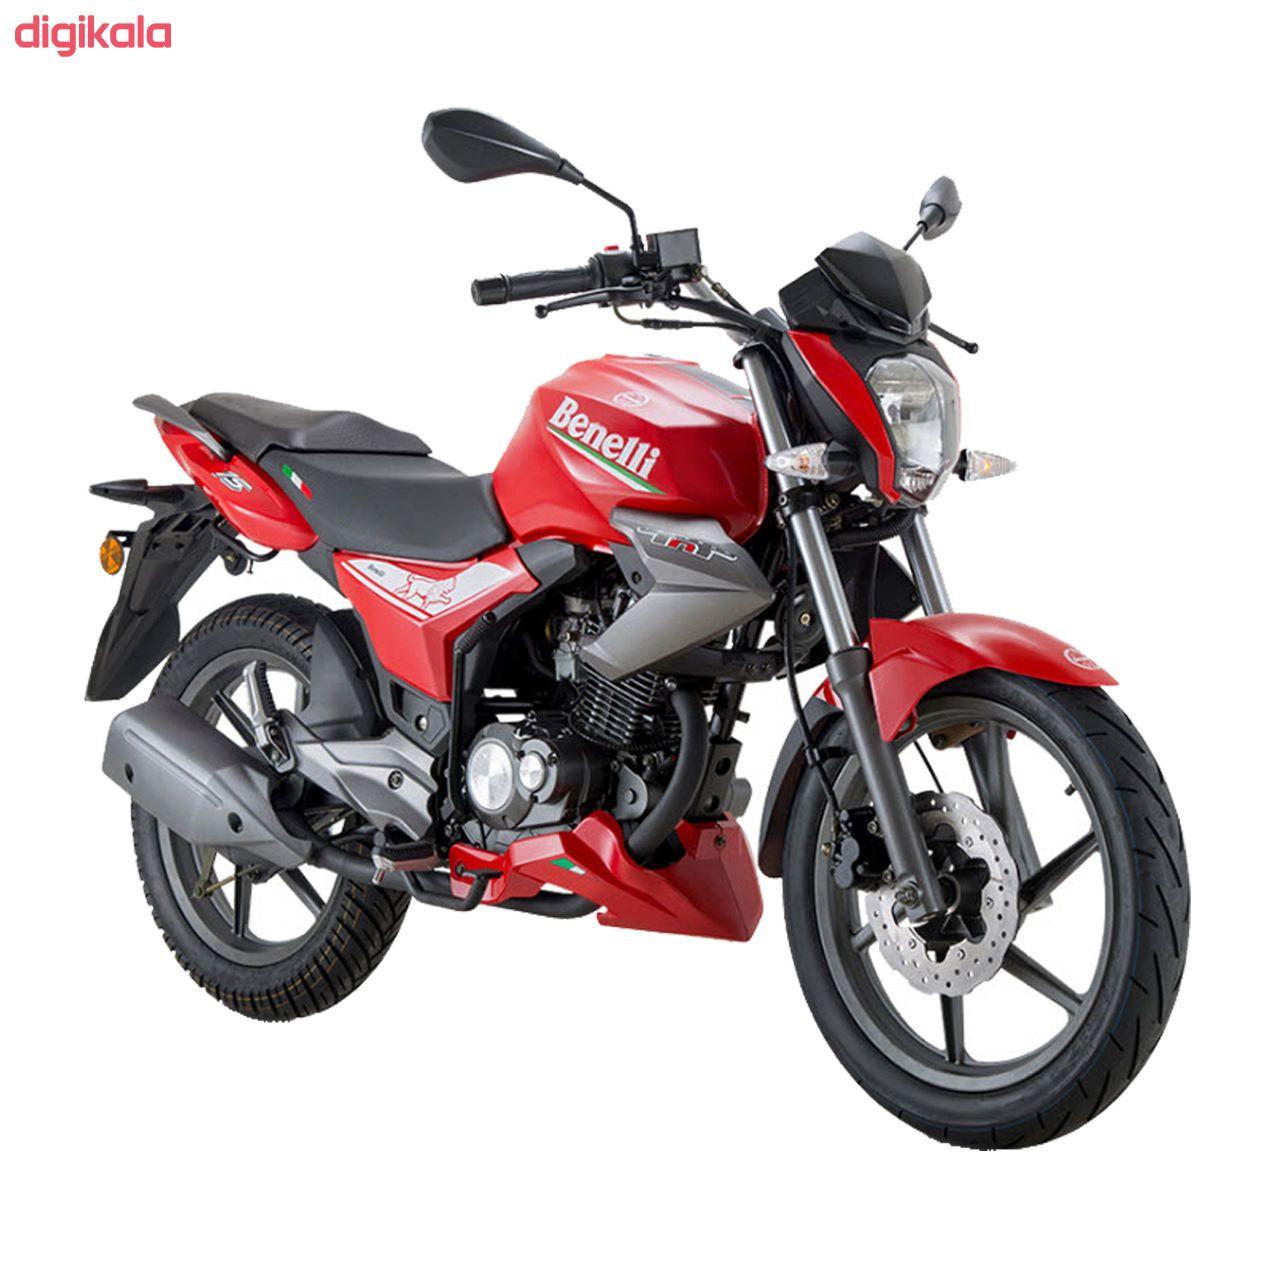 موتورسیکلت بنلی مدل تی ان تی 150 سی سی سال 1399 main 1 2